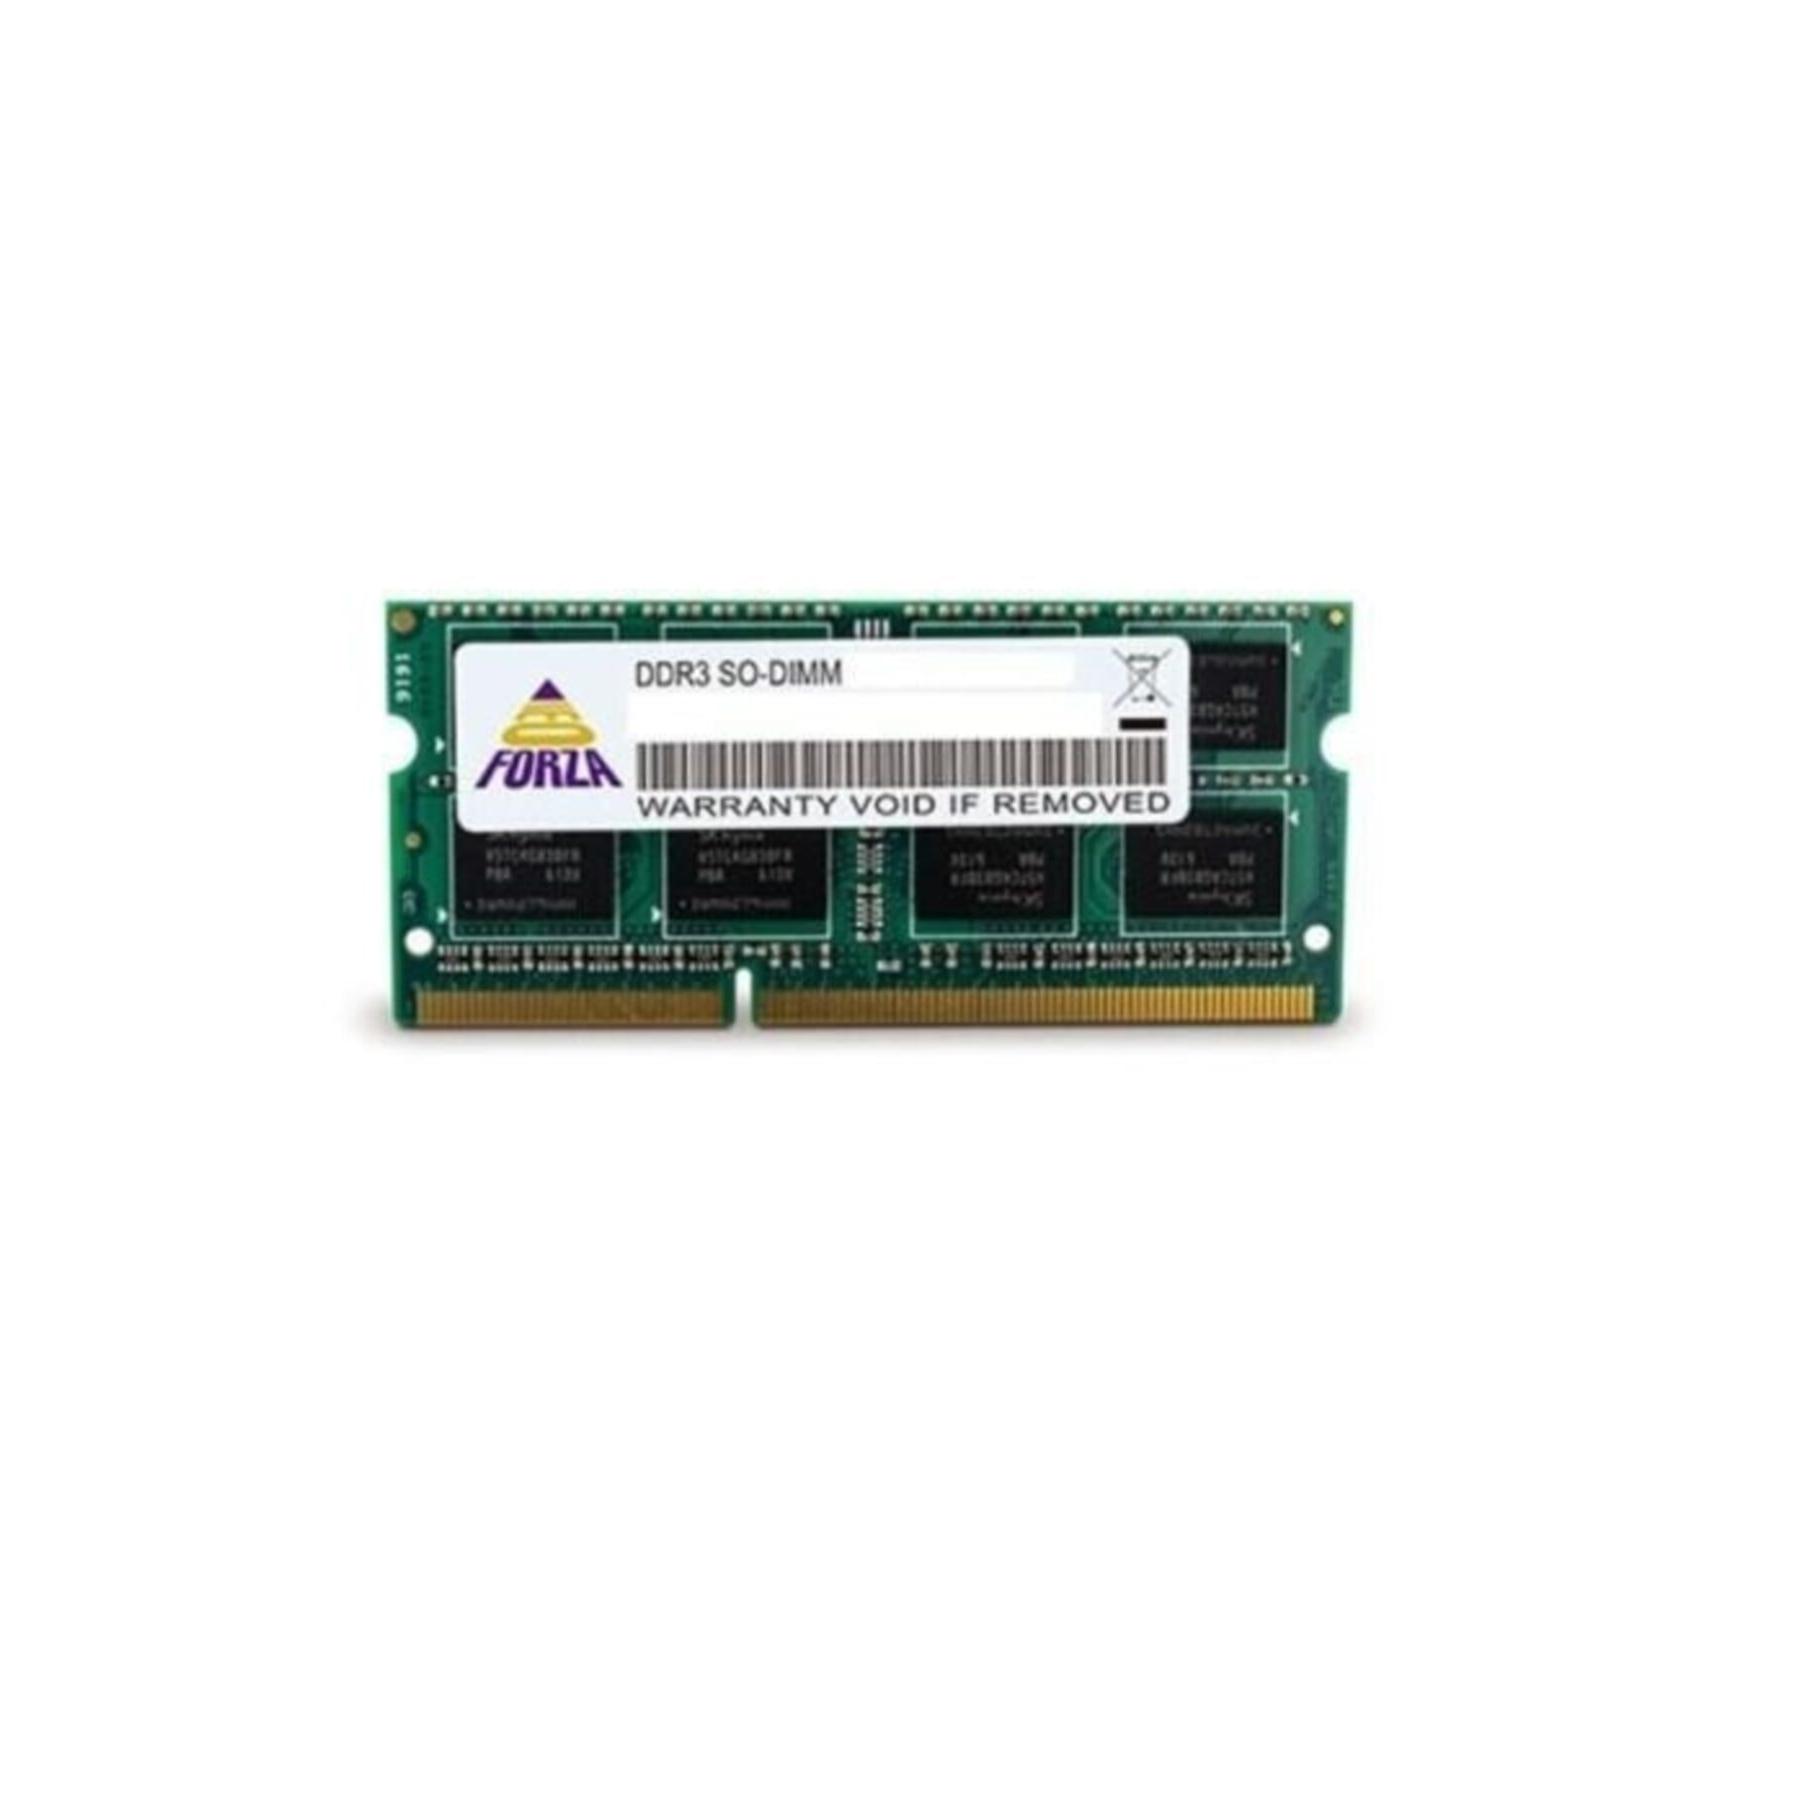 NEOFORZA 8GB 1600MHz DDR3 C11 1.35V NMSO380D81-1600DA10 NOTEBOOK RAM